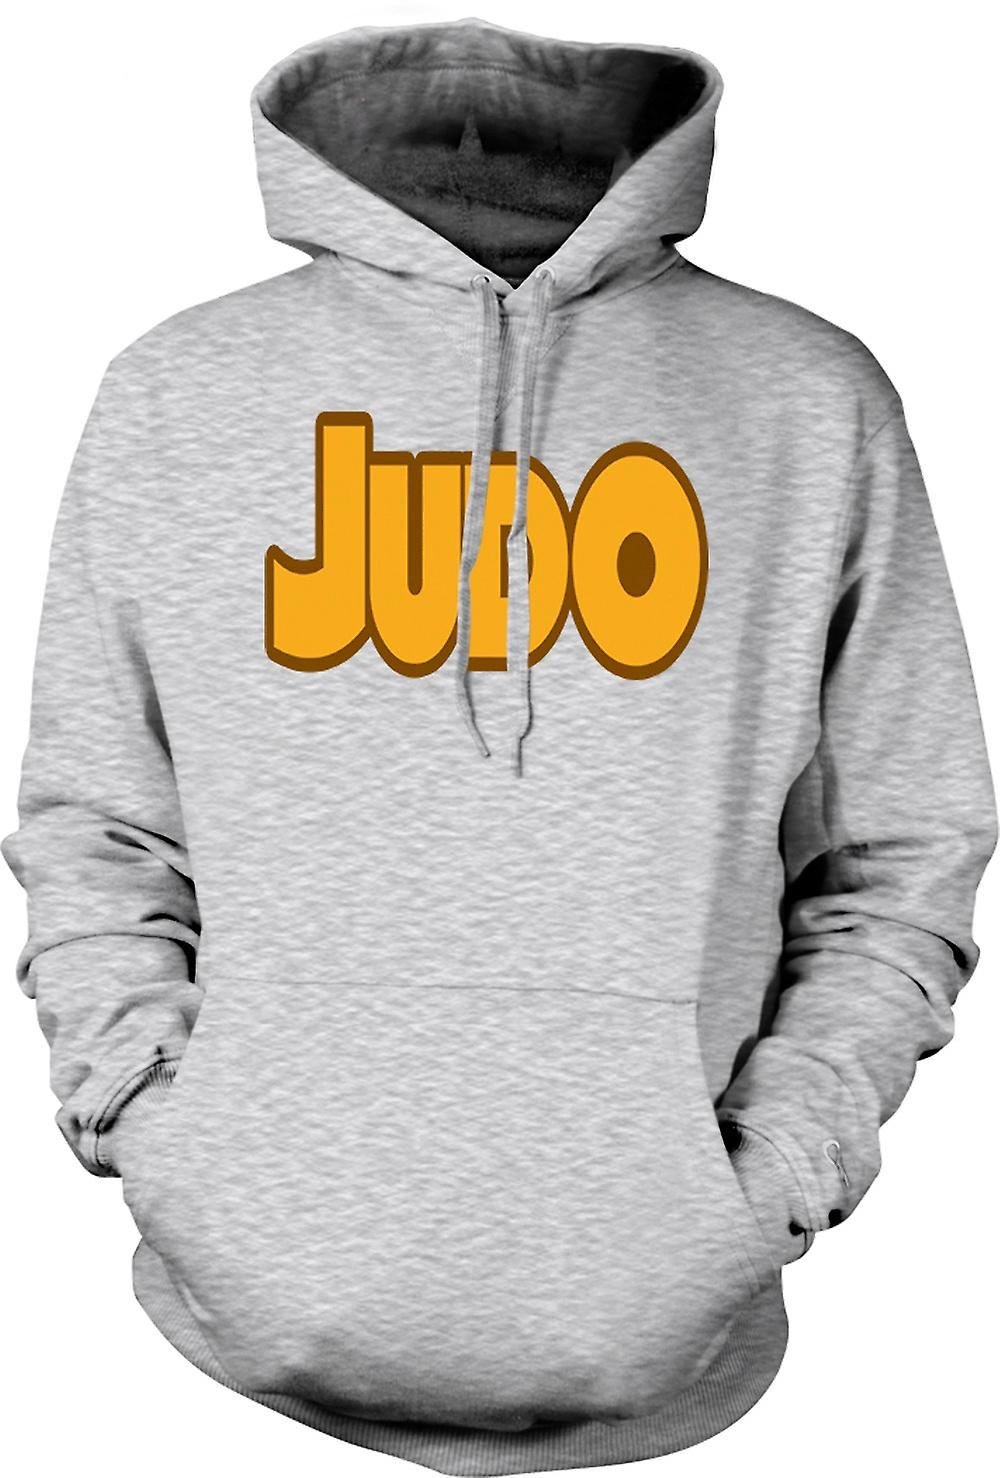 Mens Hoodie - Judo - Martial Art - Slogan